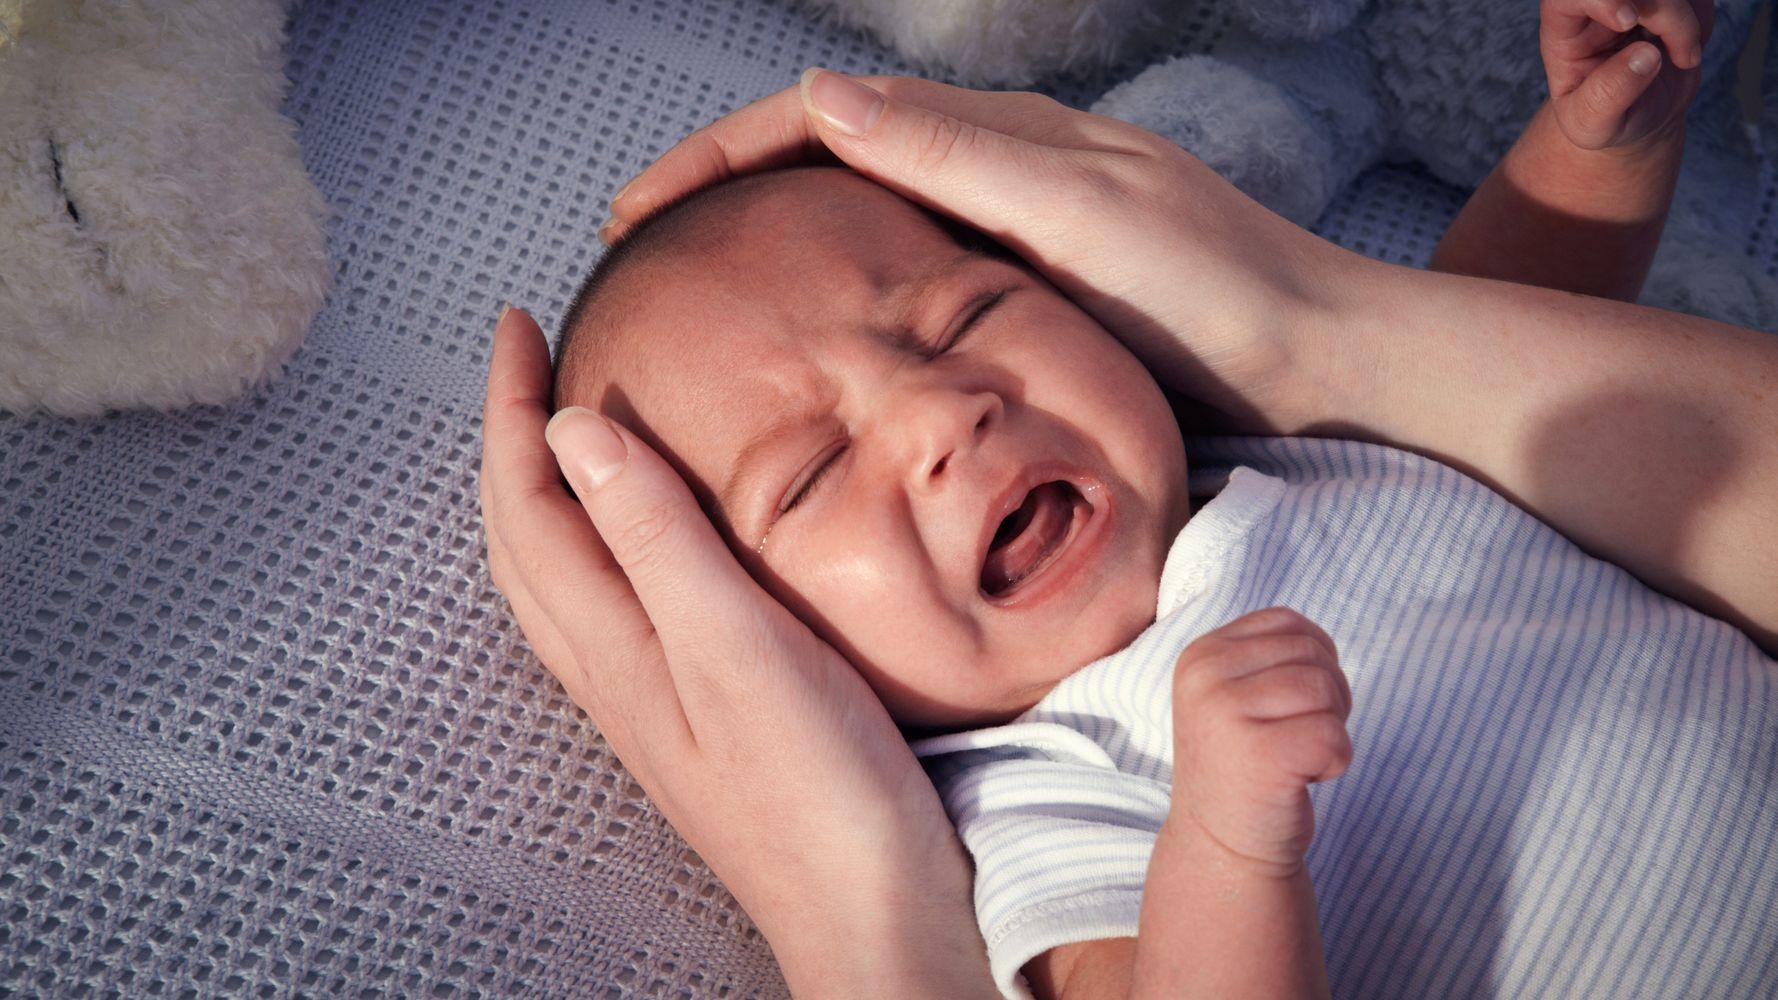 18 Dark And Disturbing Lullabies From Around The World | HuffPost Life